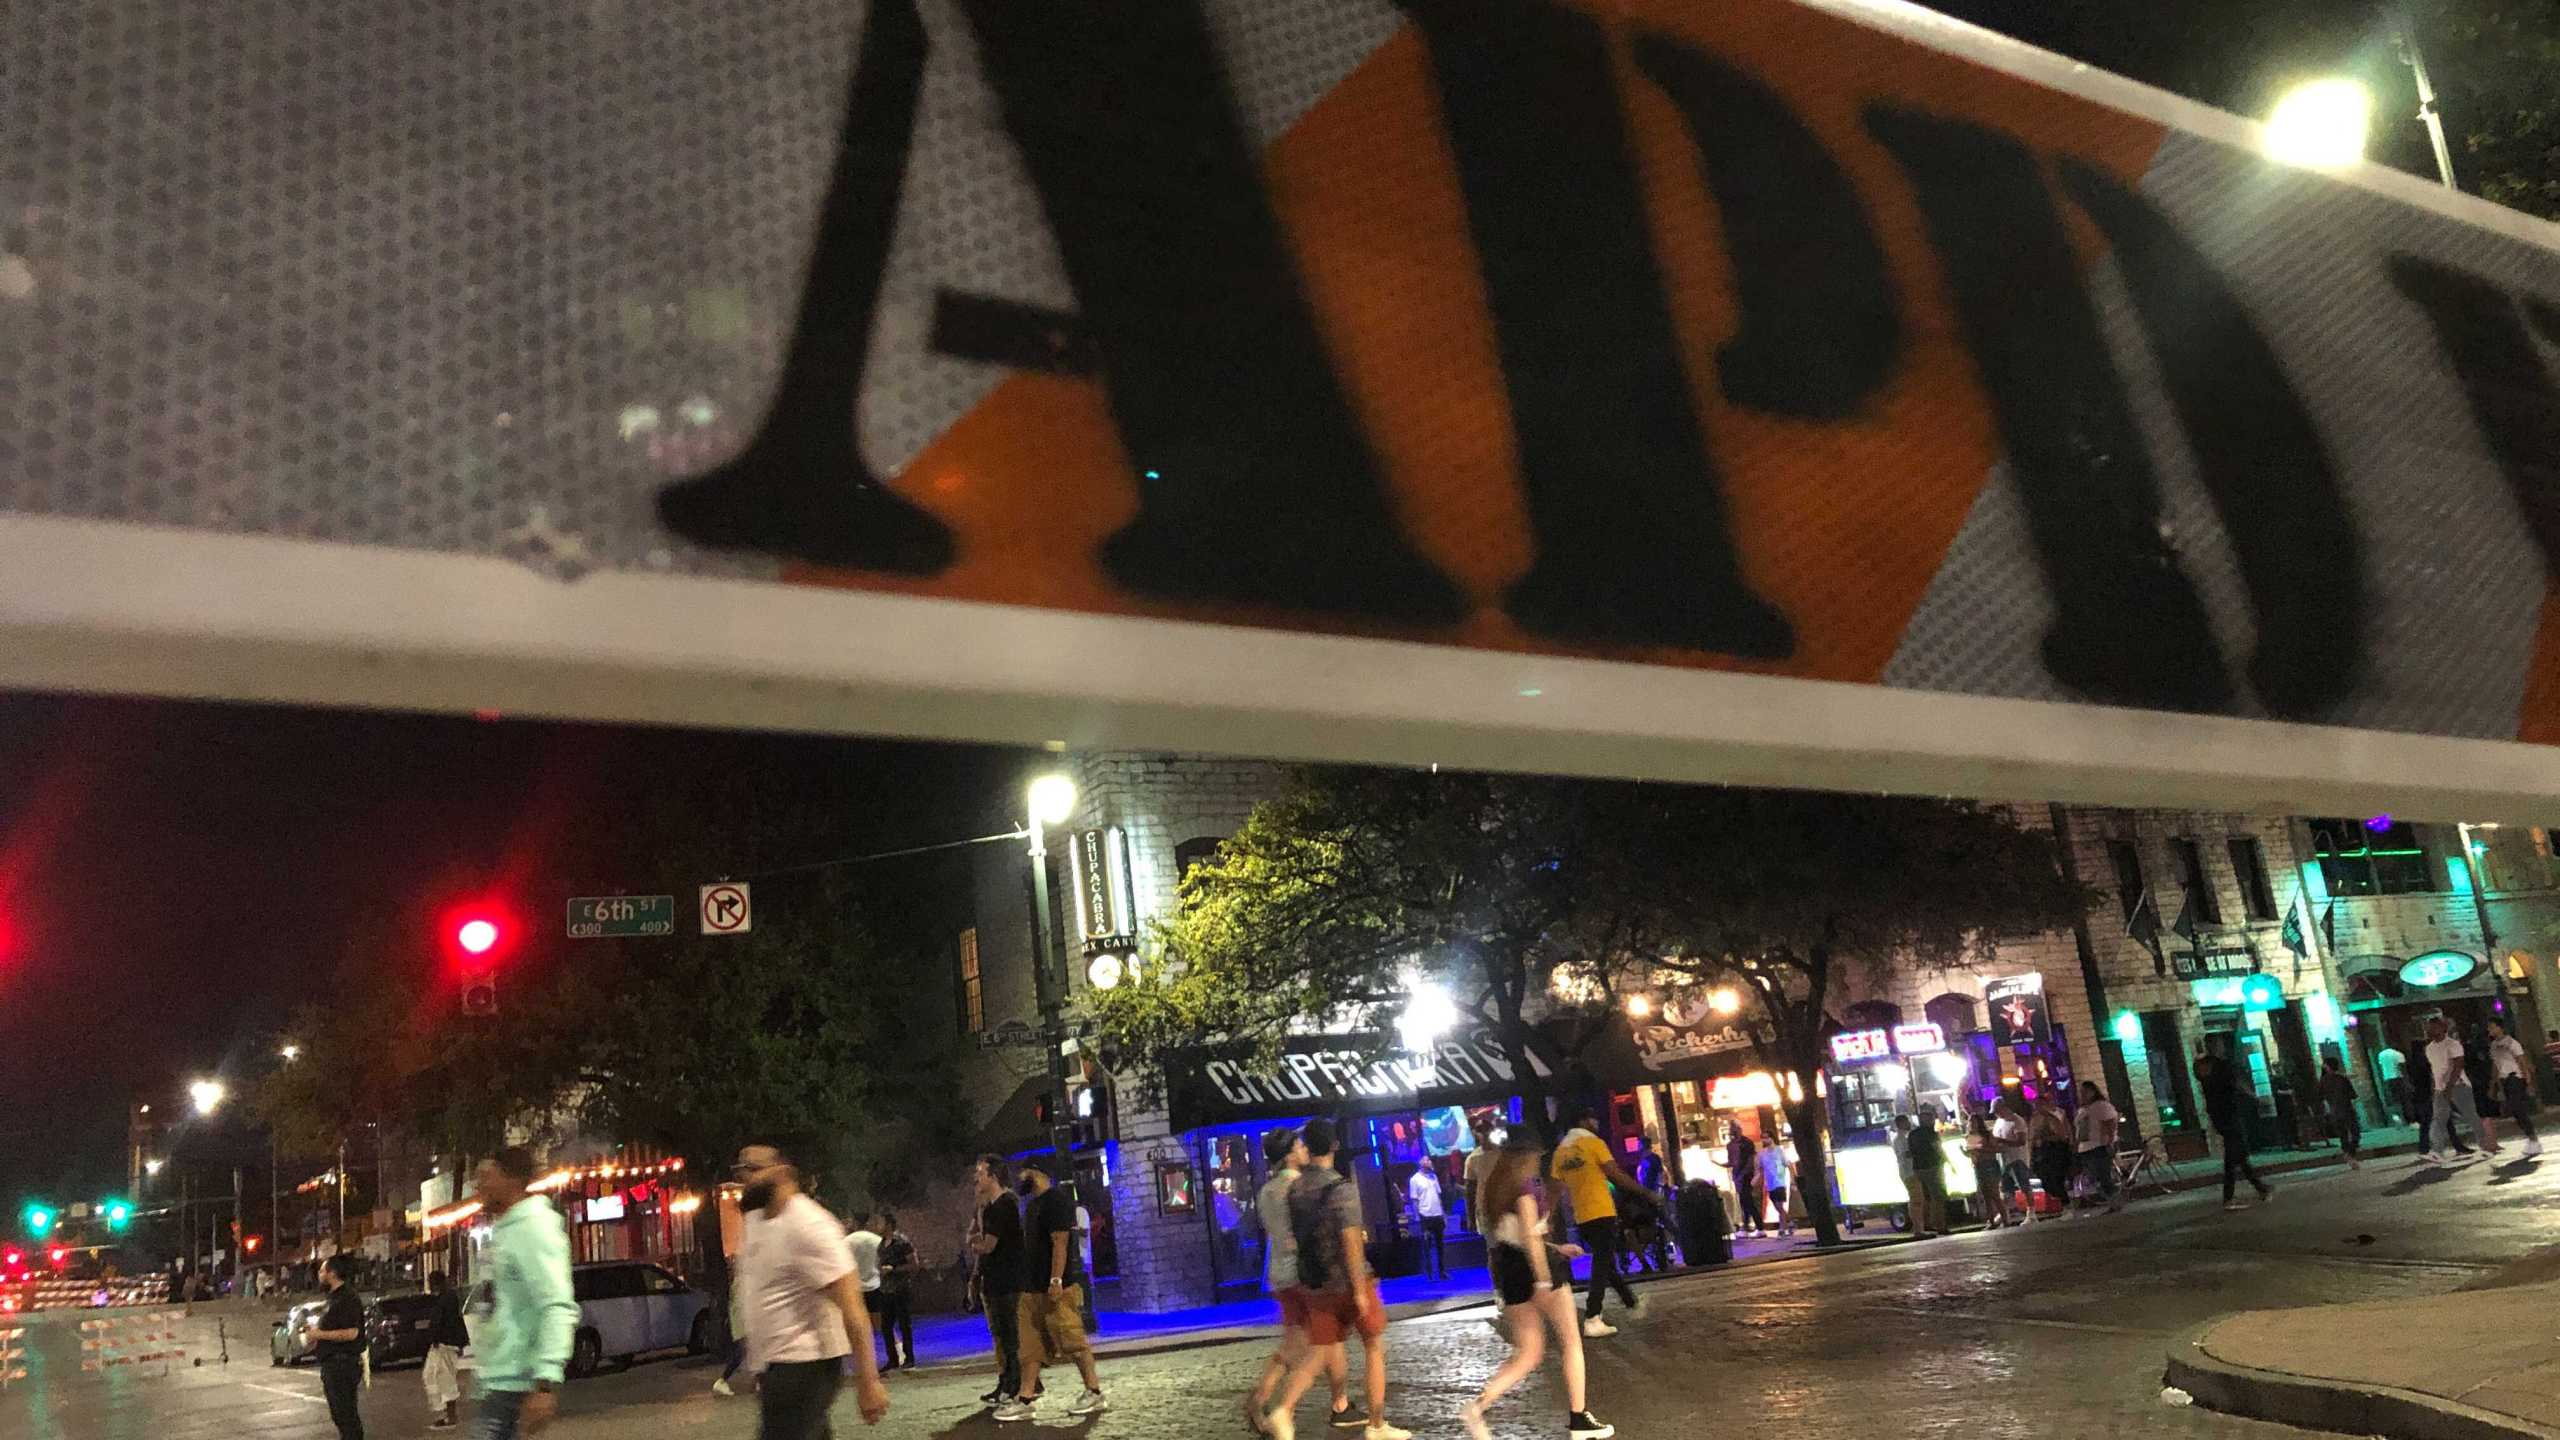 An APD barrier on 6th Street